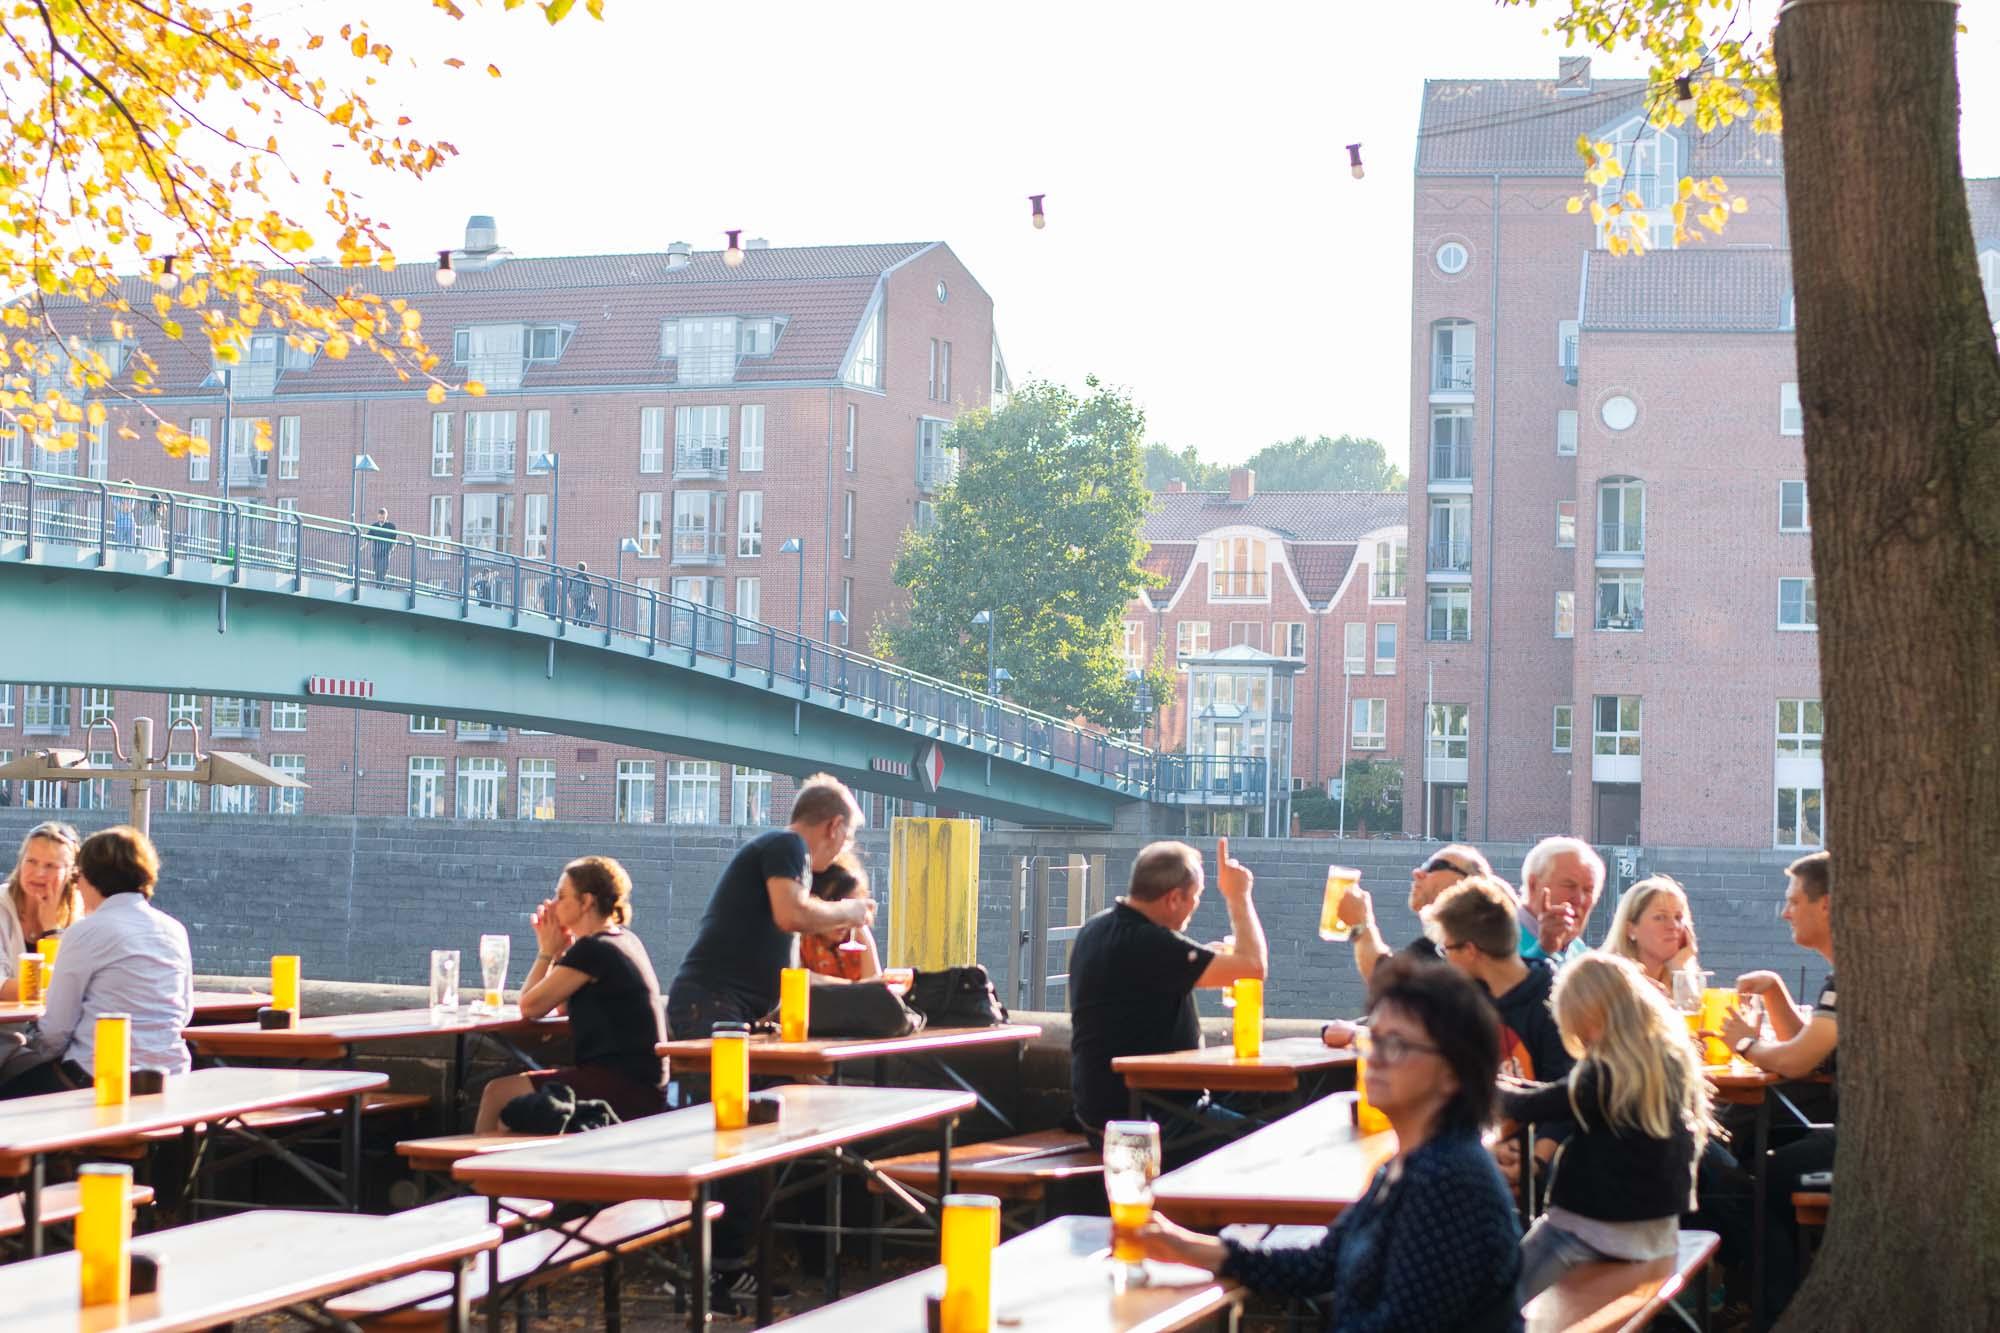 The biergarten by the Weser River in Bremen, Germany.